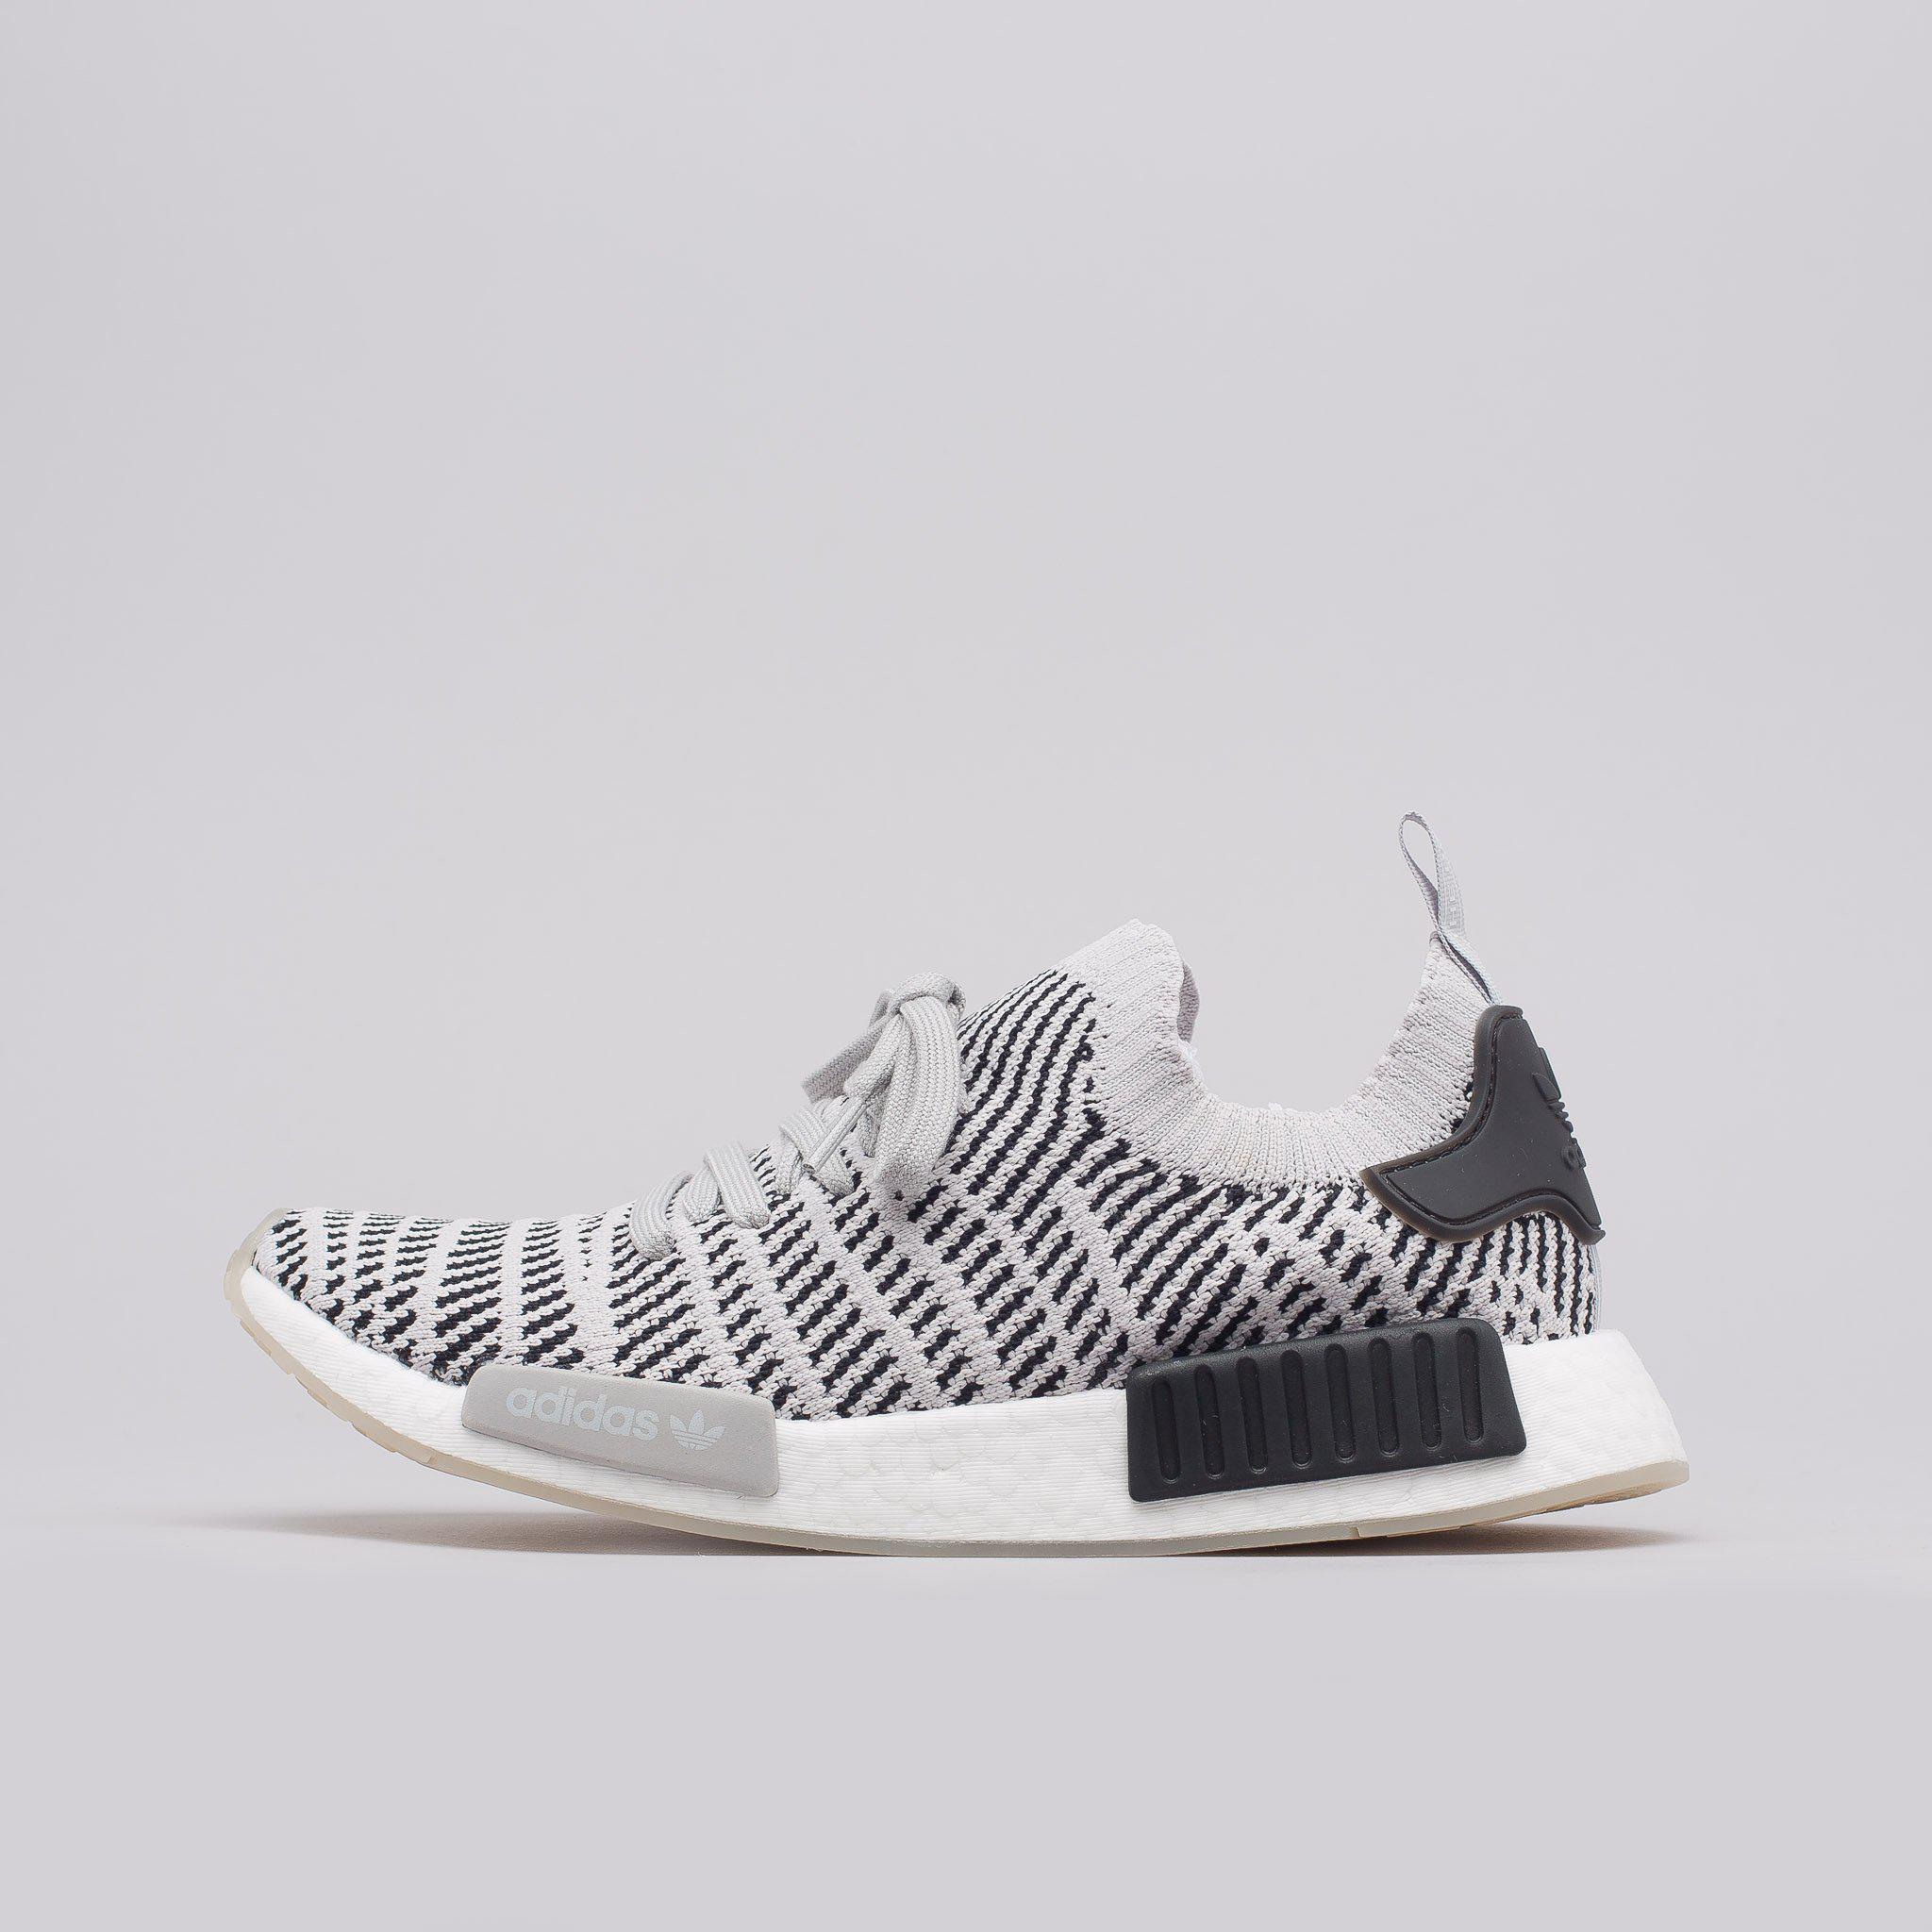 b20faade6 Lyst - adidas Nmd R1 Stlt Primeknit In Grey in Gray for Men